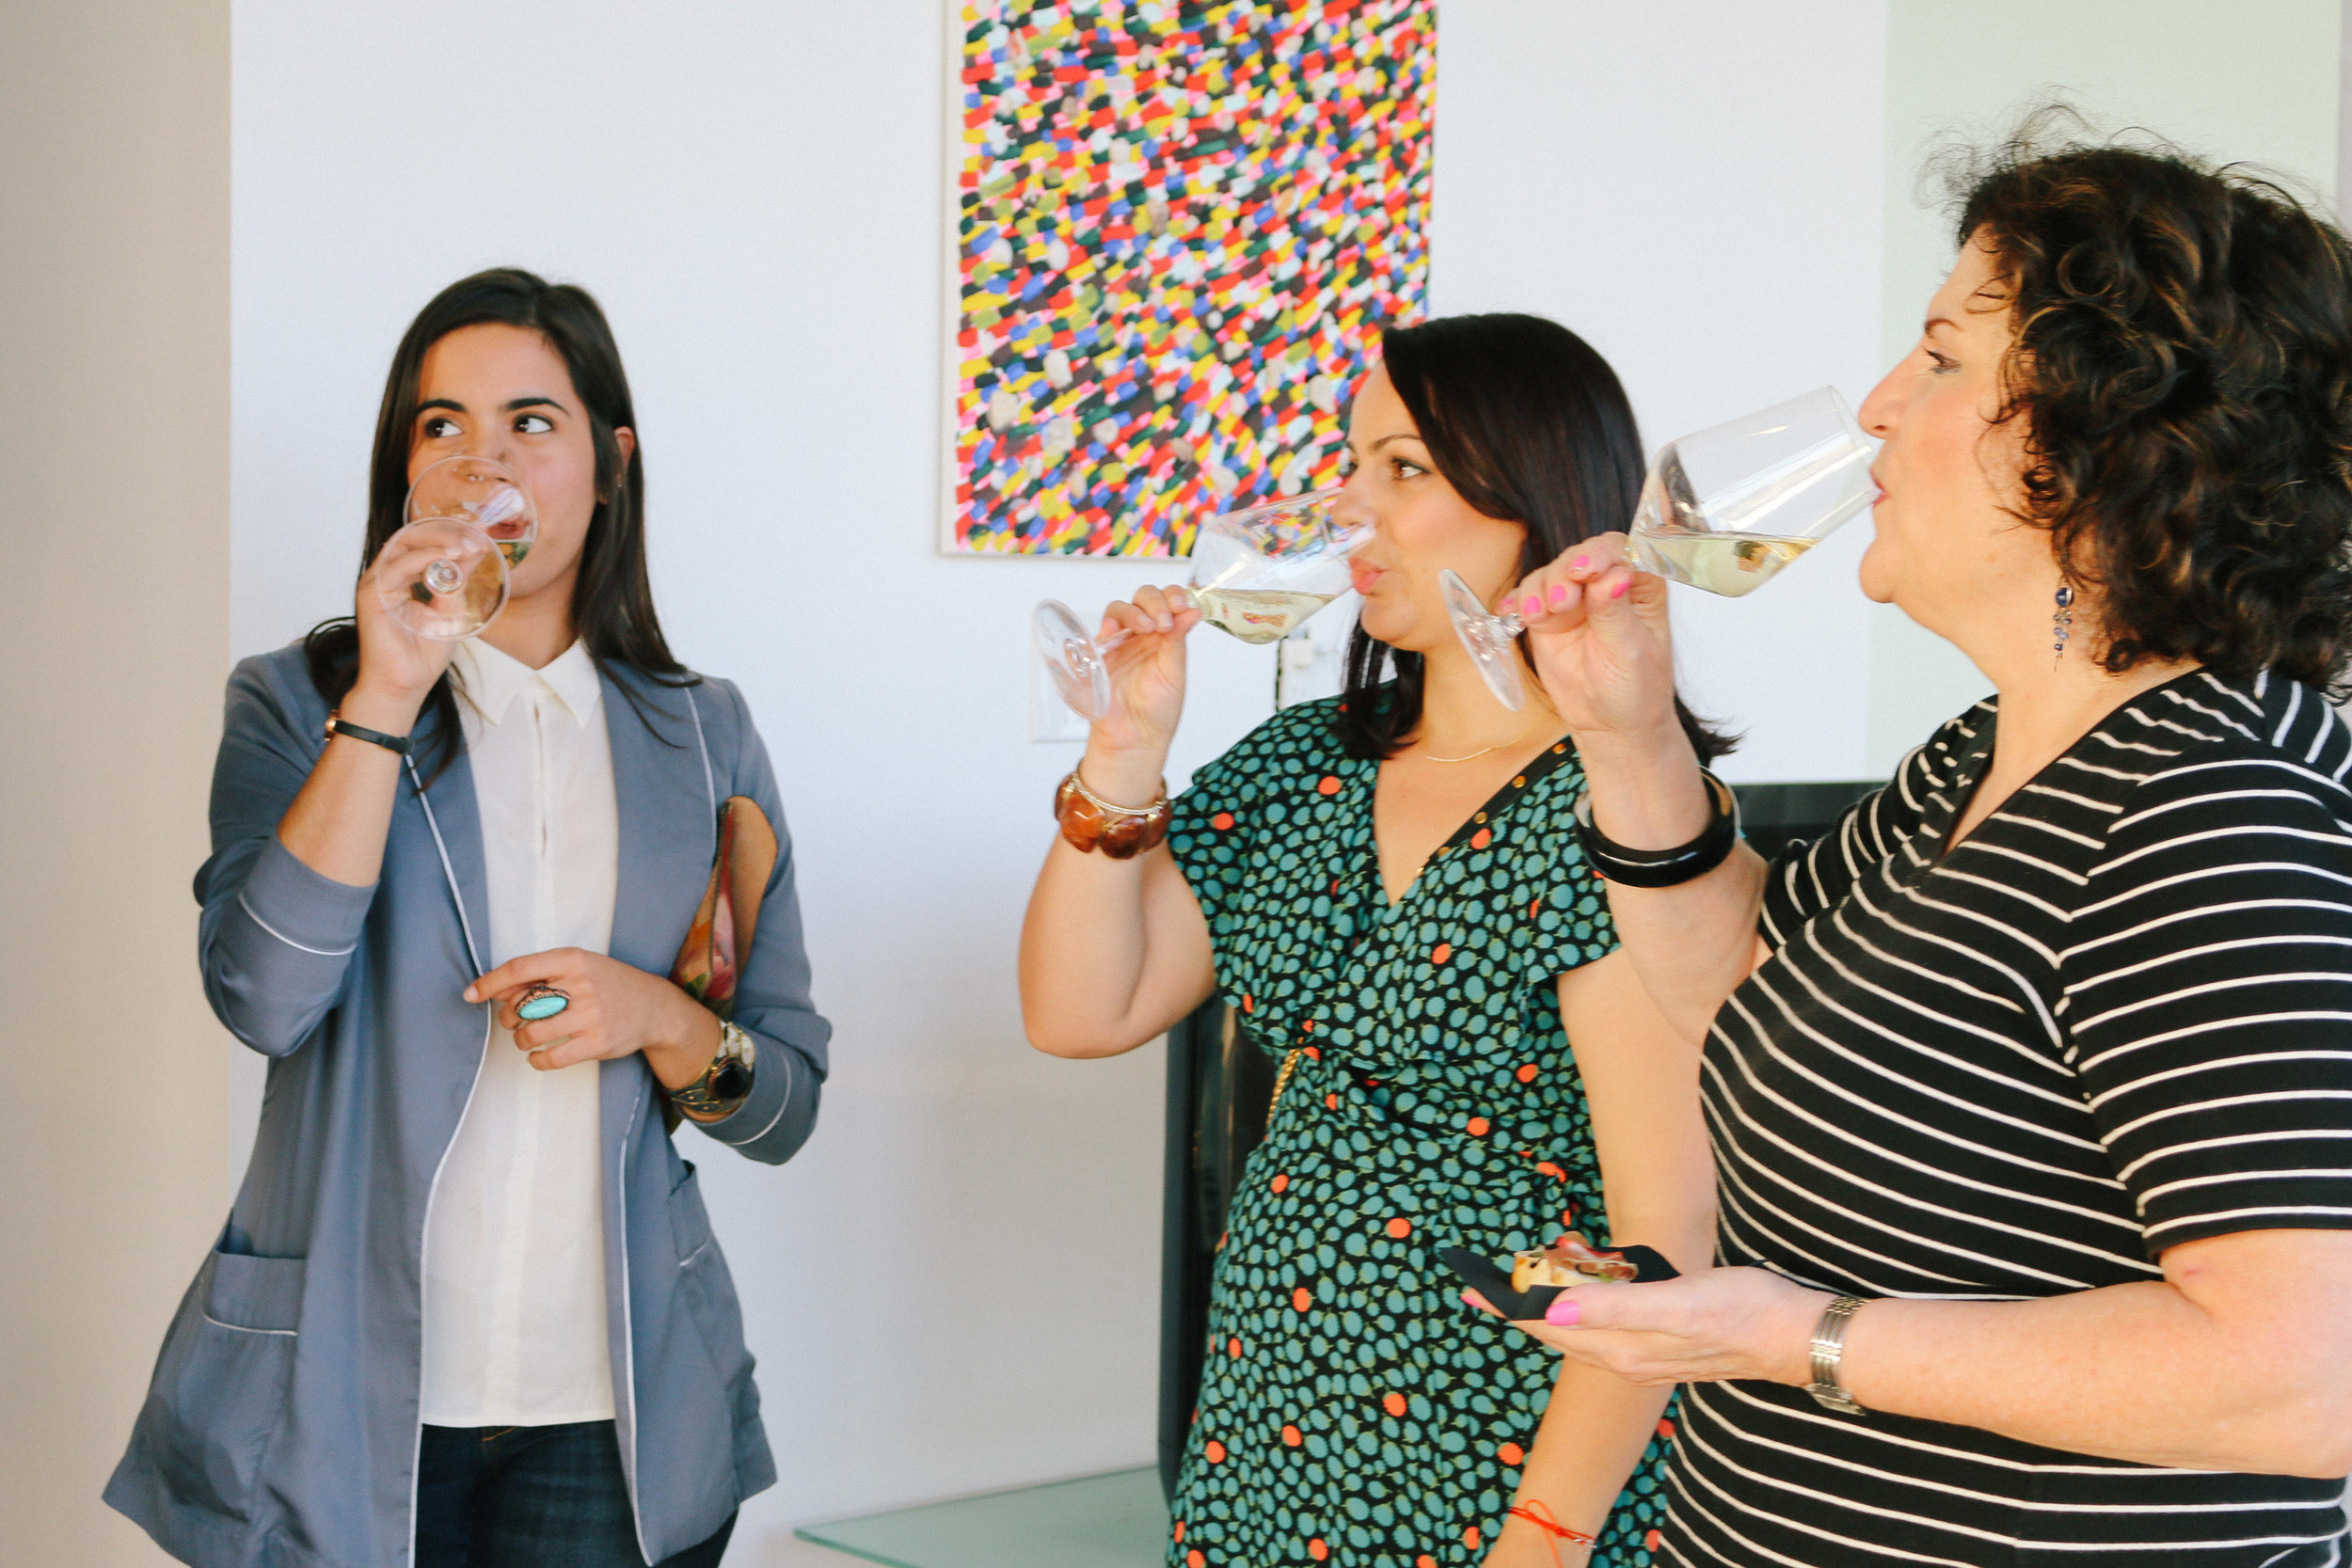 Women Who Wine Uncorked Conversations-Miami Wine Events-Wine Tasting Miami-12.jpg